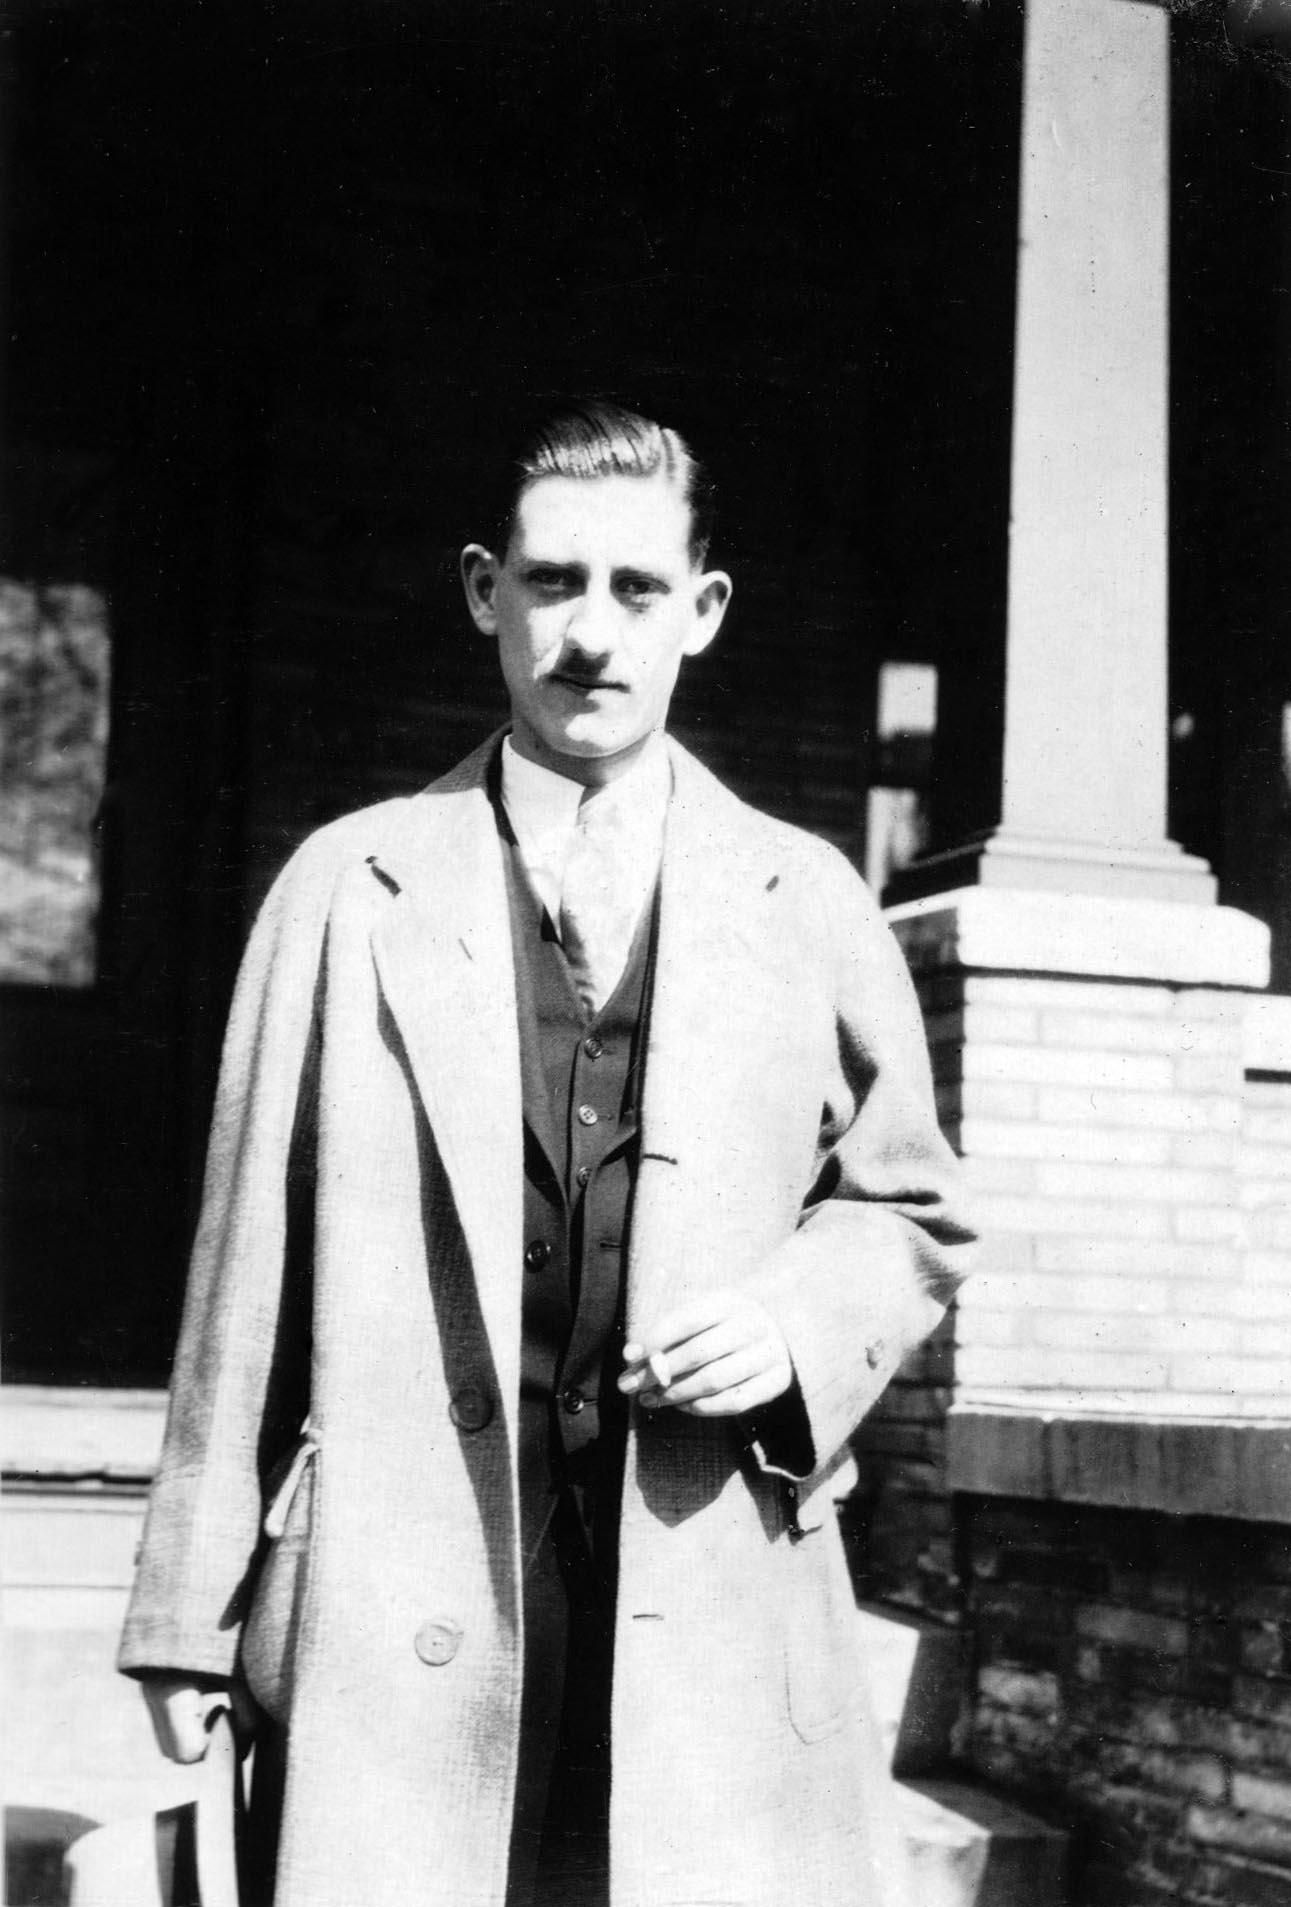 Norman E. Frick 1926